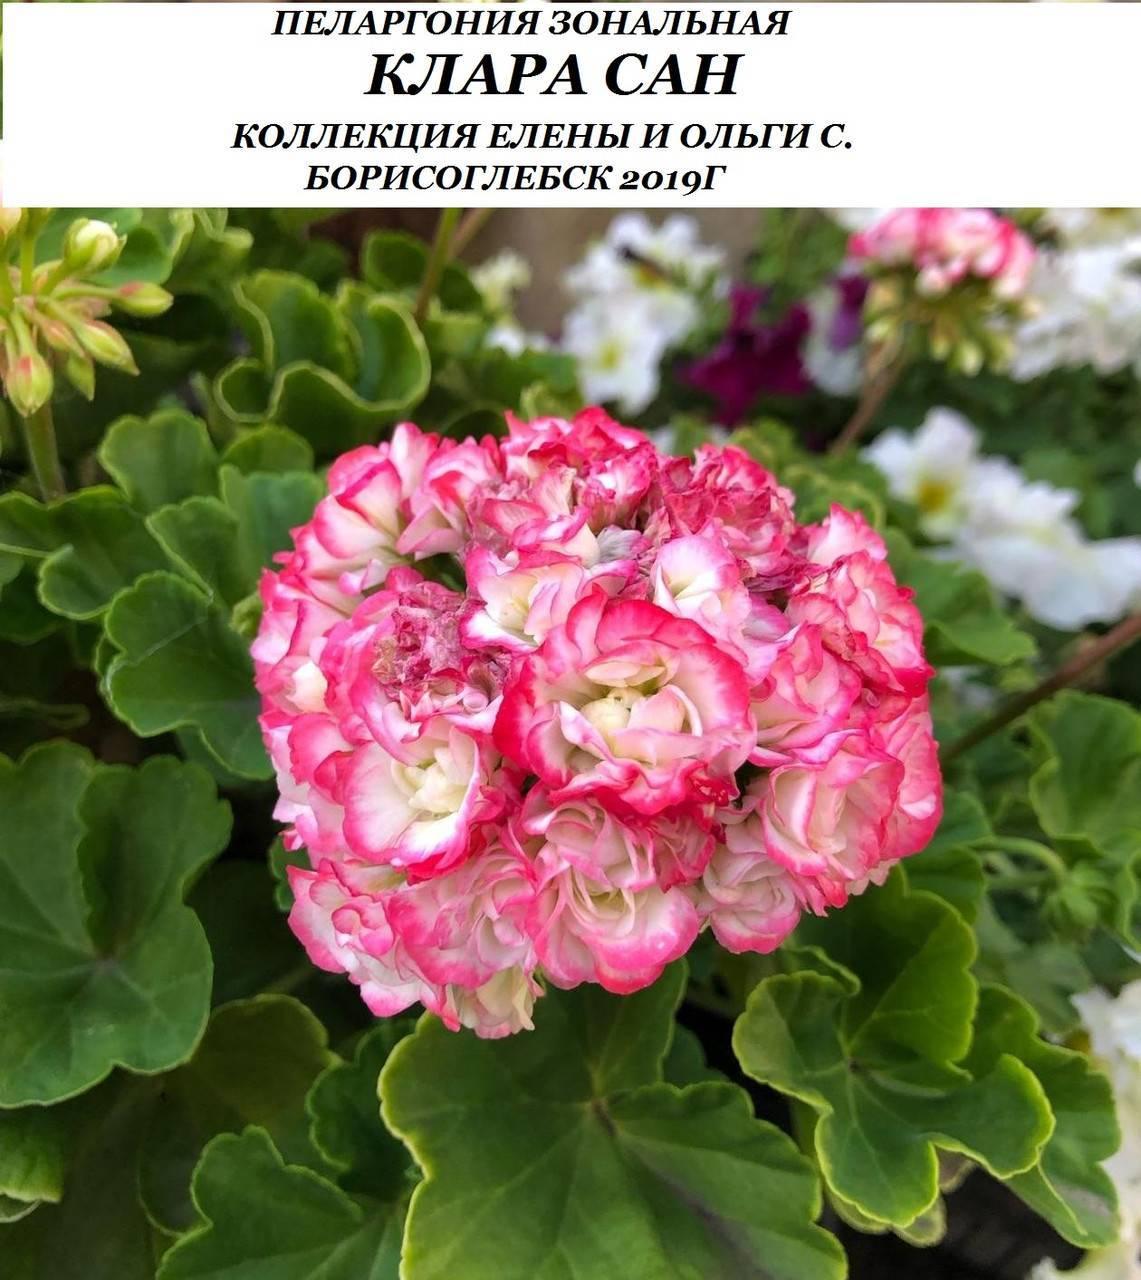 Пеларгония клара сан: описание внешнего вида, уход и размножение, а также болезни и вредители